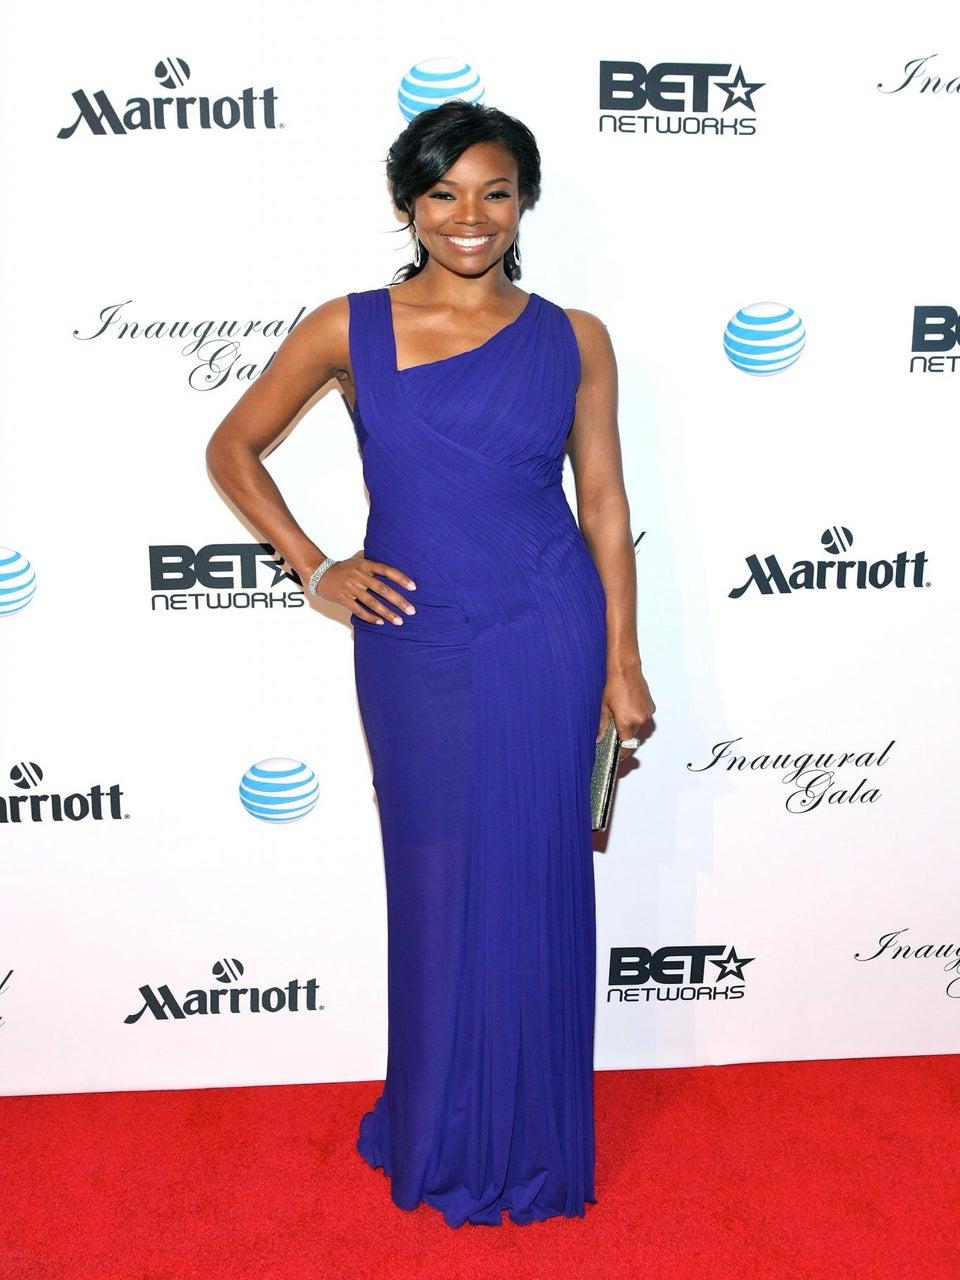 Attend ESSENCE's Black Women in Hollywood Film Festival